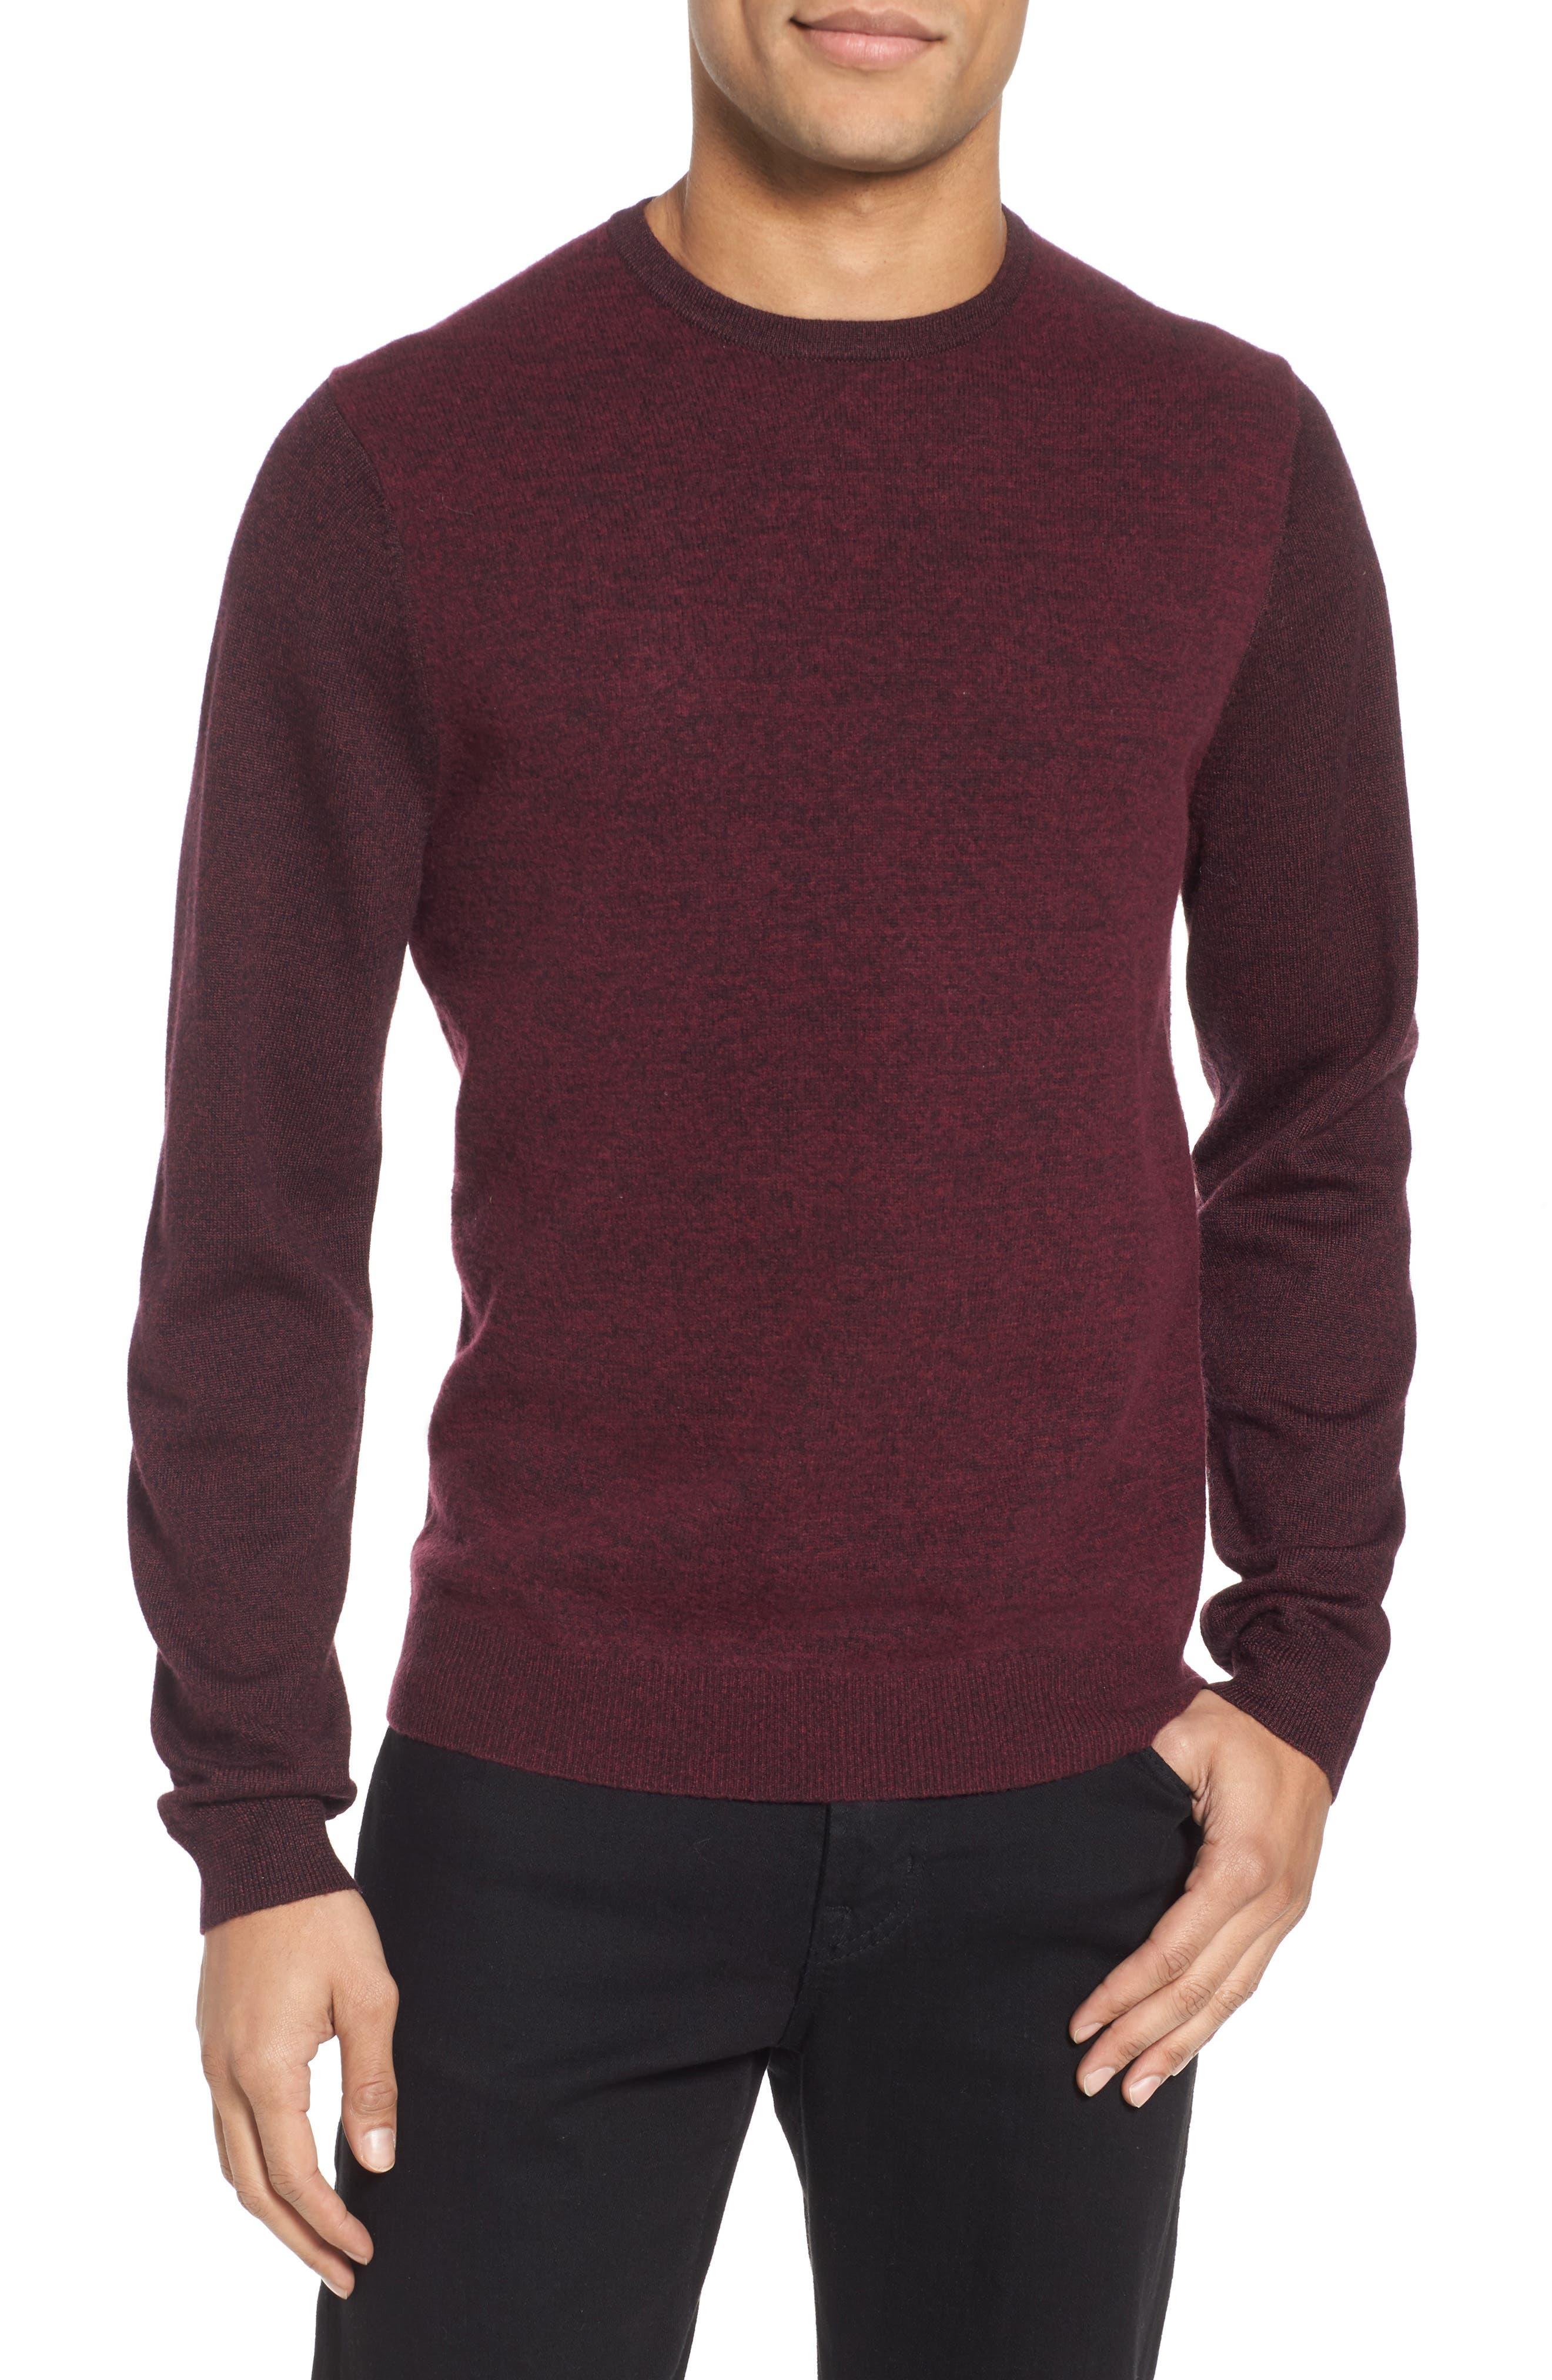 Boiled Wool Blend Crewneck Sweater,                             Main thumbnail 1, color,                             Burgundy Stem